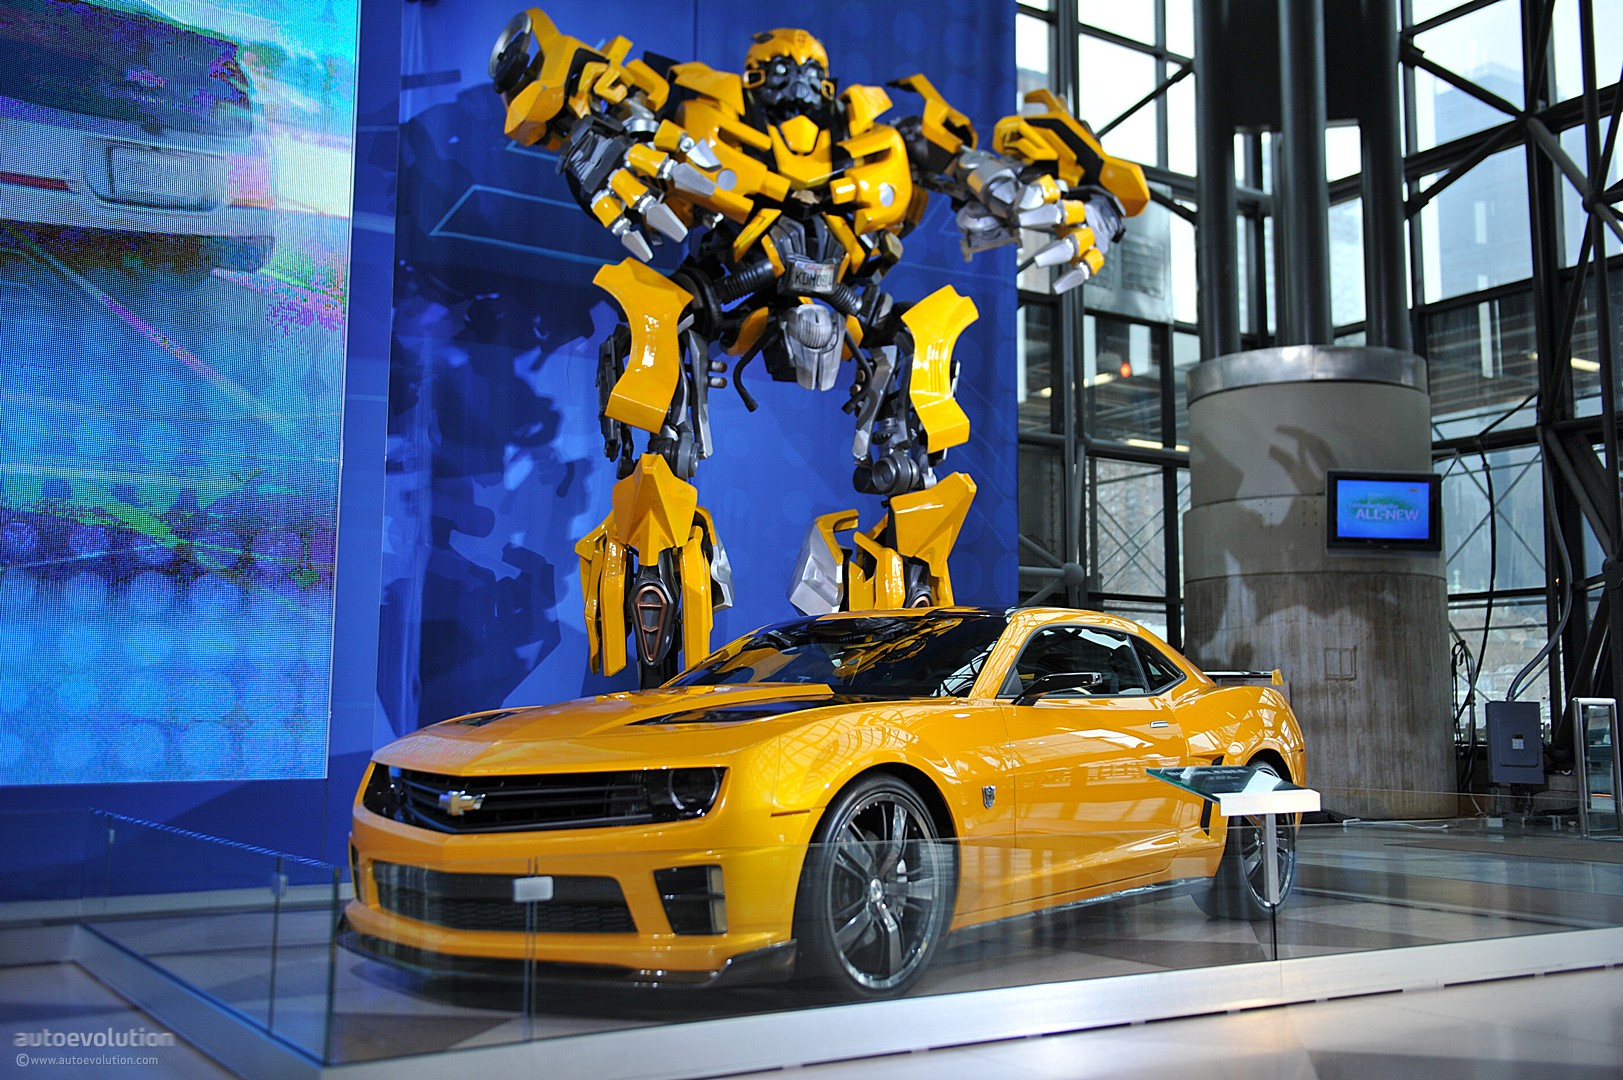 Bumblebee the transformers photo 36912291 fanpop - Transformers bumblebee car wallpaper ...